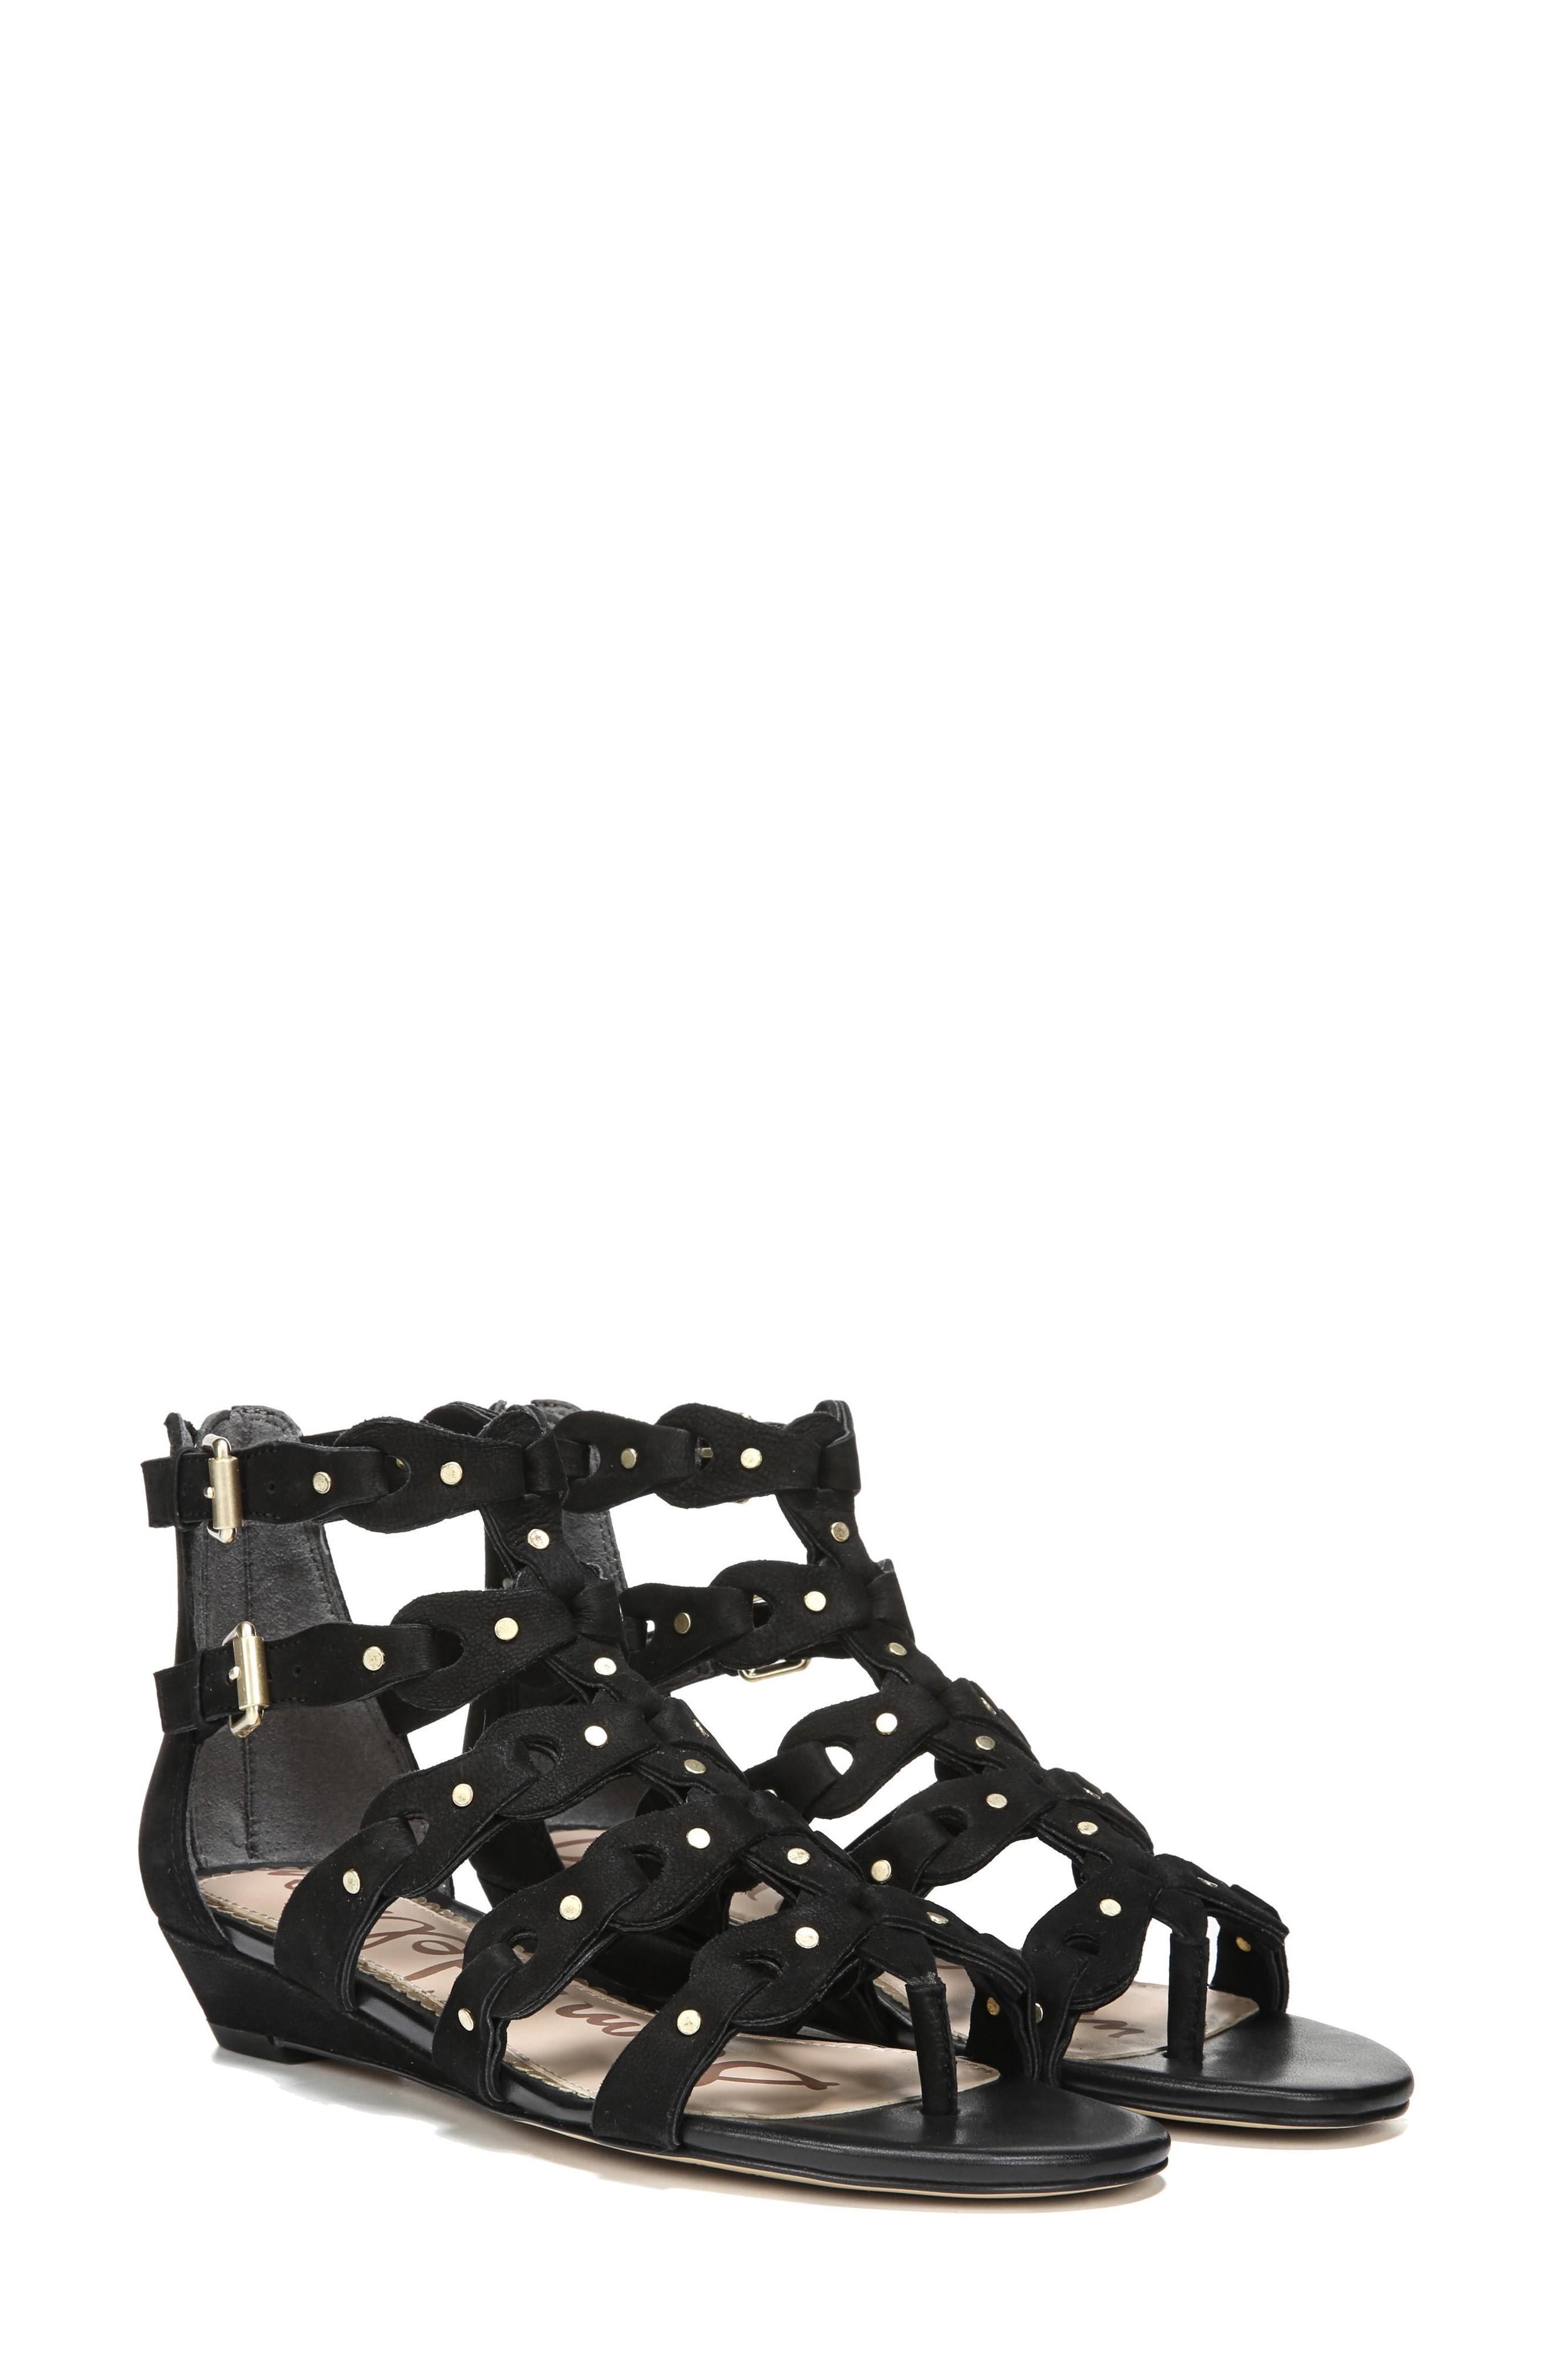 9d41052505f Sam Edelman Draper Cage Sandal In Black Nubuck Leather